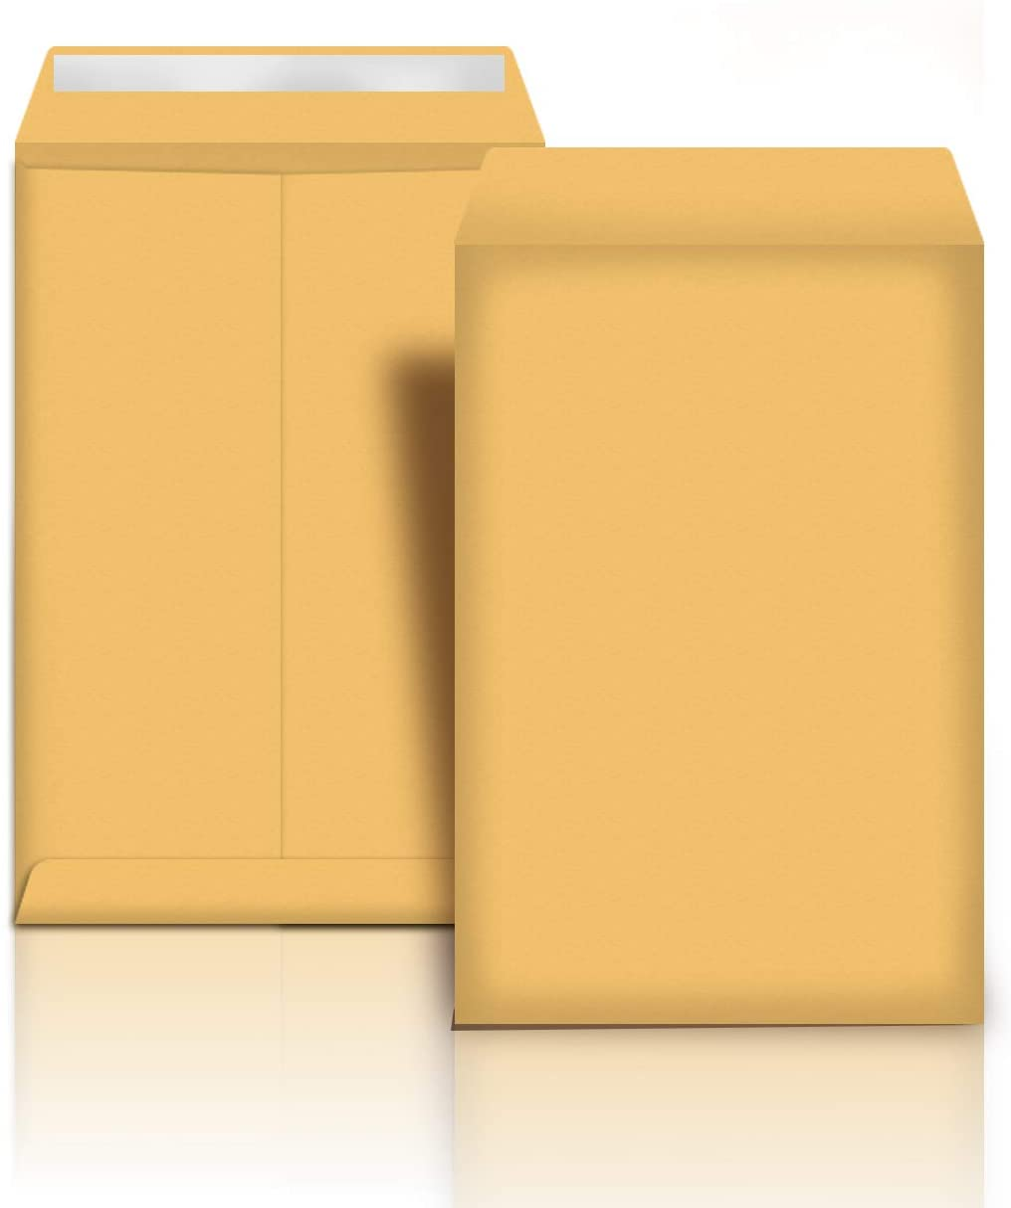 AmazonBasics Catalog Mailing Envelopes, Peel & Seal, 9x12 Inch, Brown Kraft, 100-Pack - AMZP13